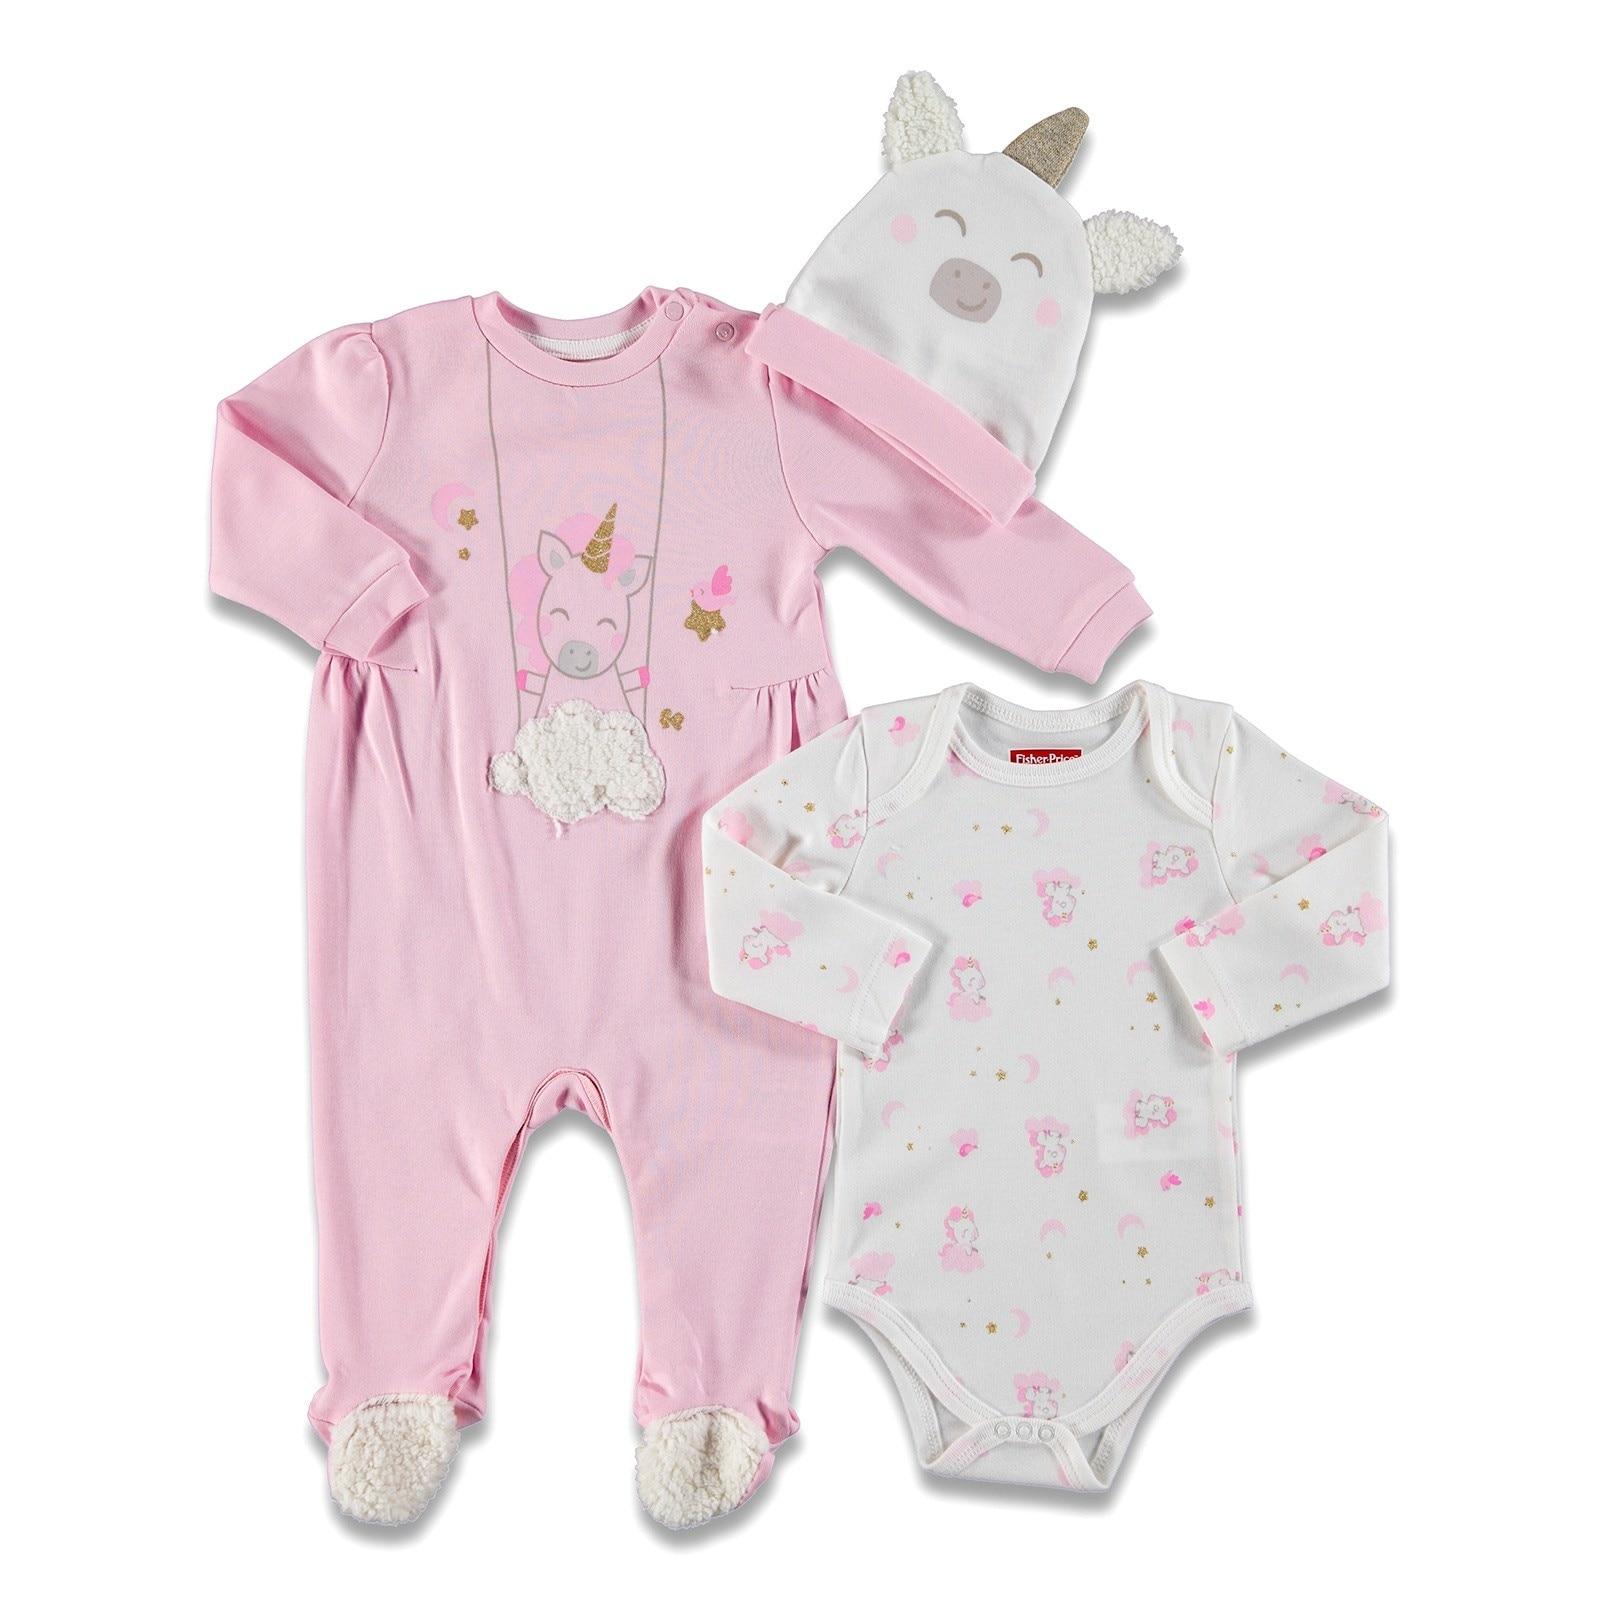 Ebebek Fisher Price Magical Unicorn Baby Romper Hat Bodysuit 3 Pack Set